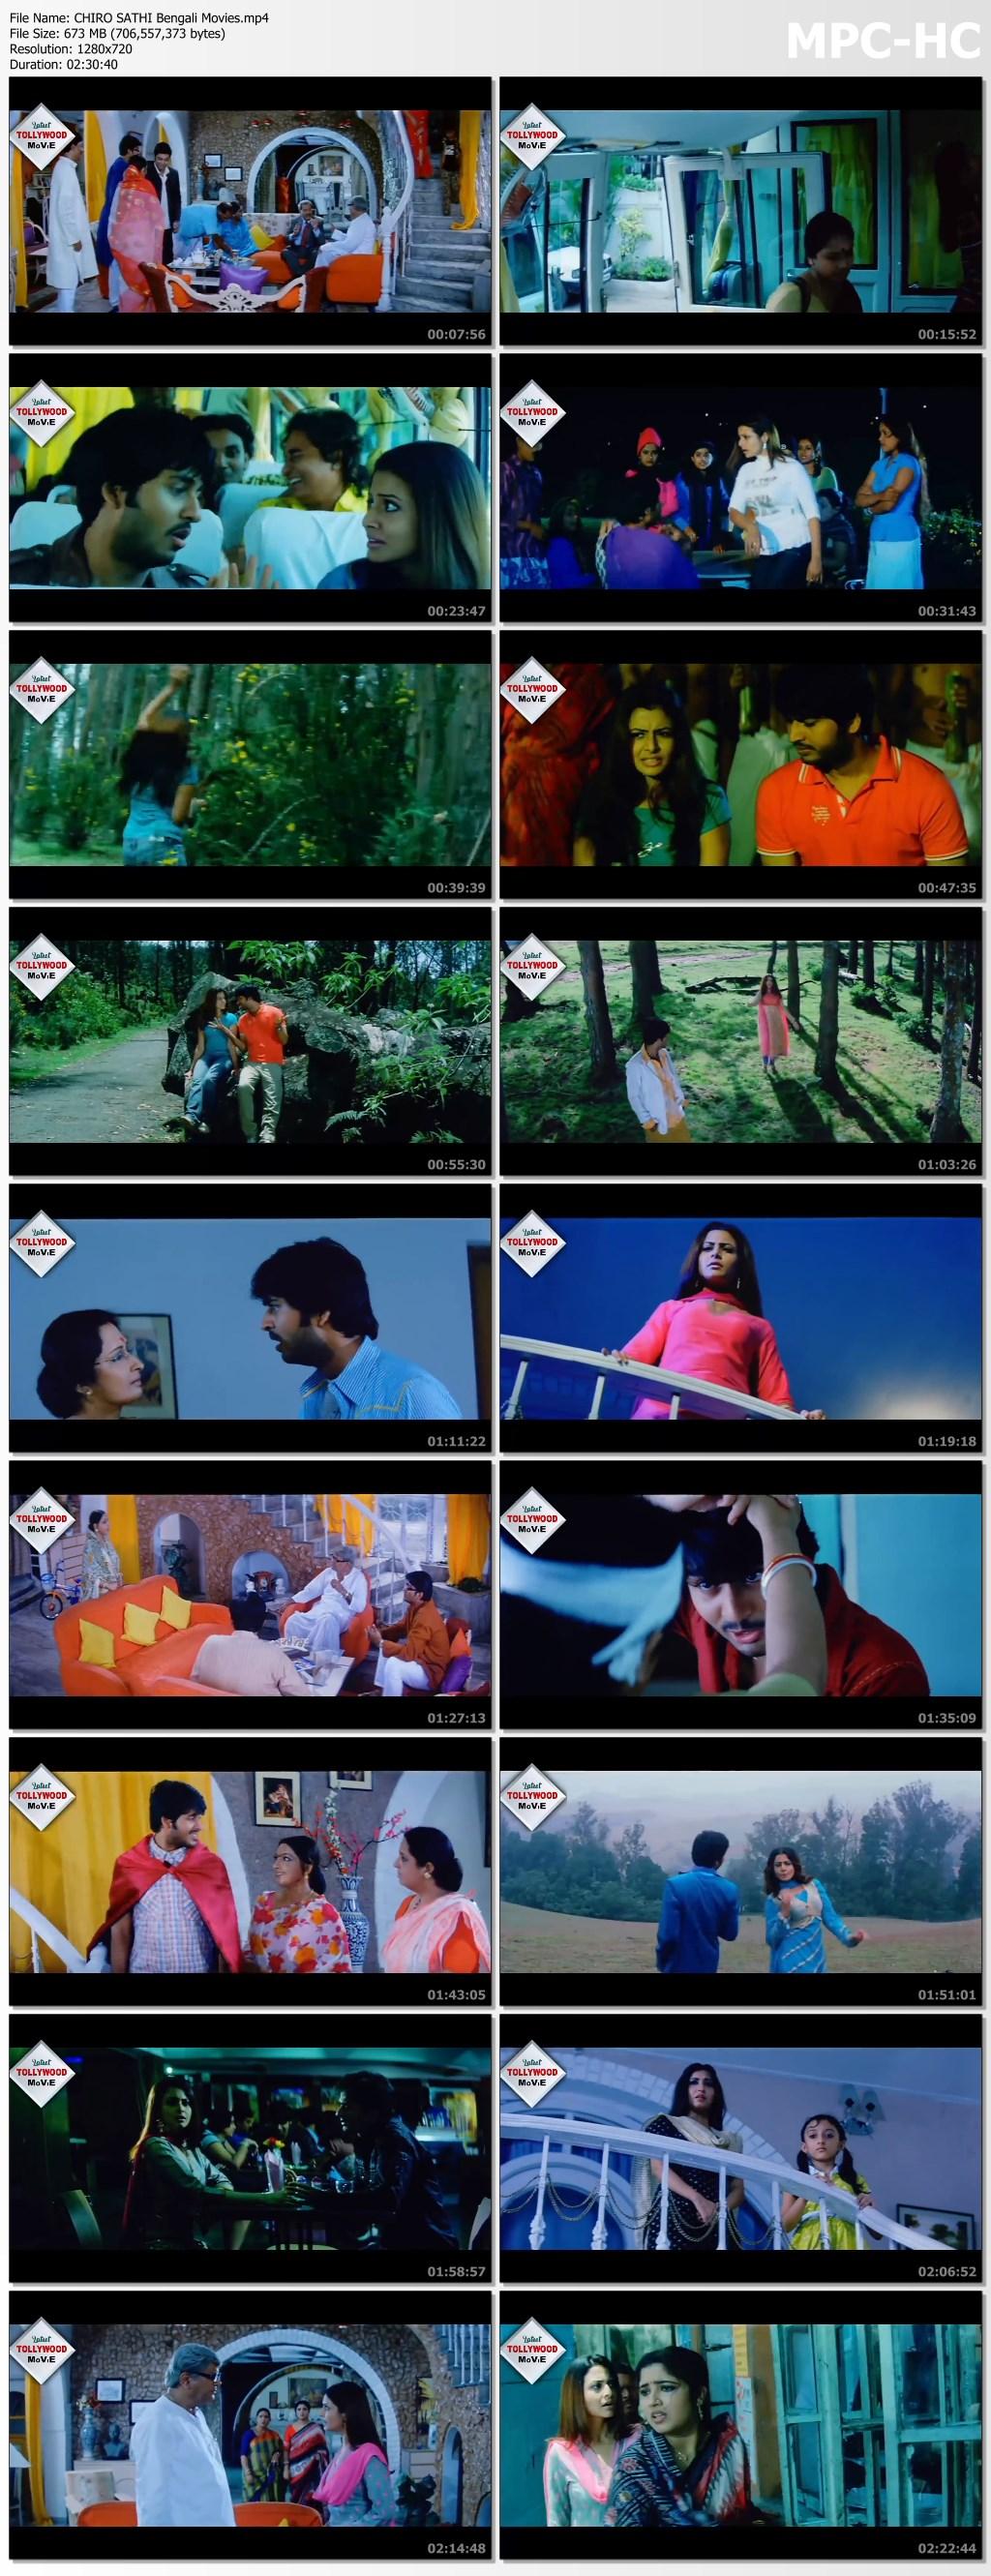 CHIRO SATHI Bengali Movies.mp4 thumbs